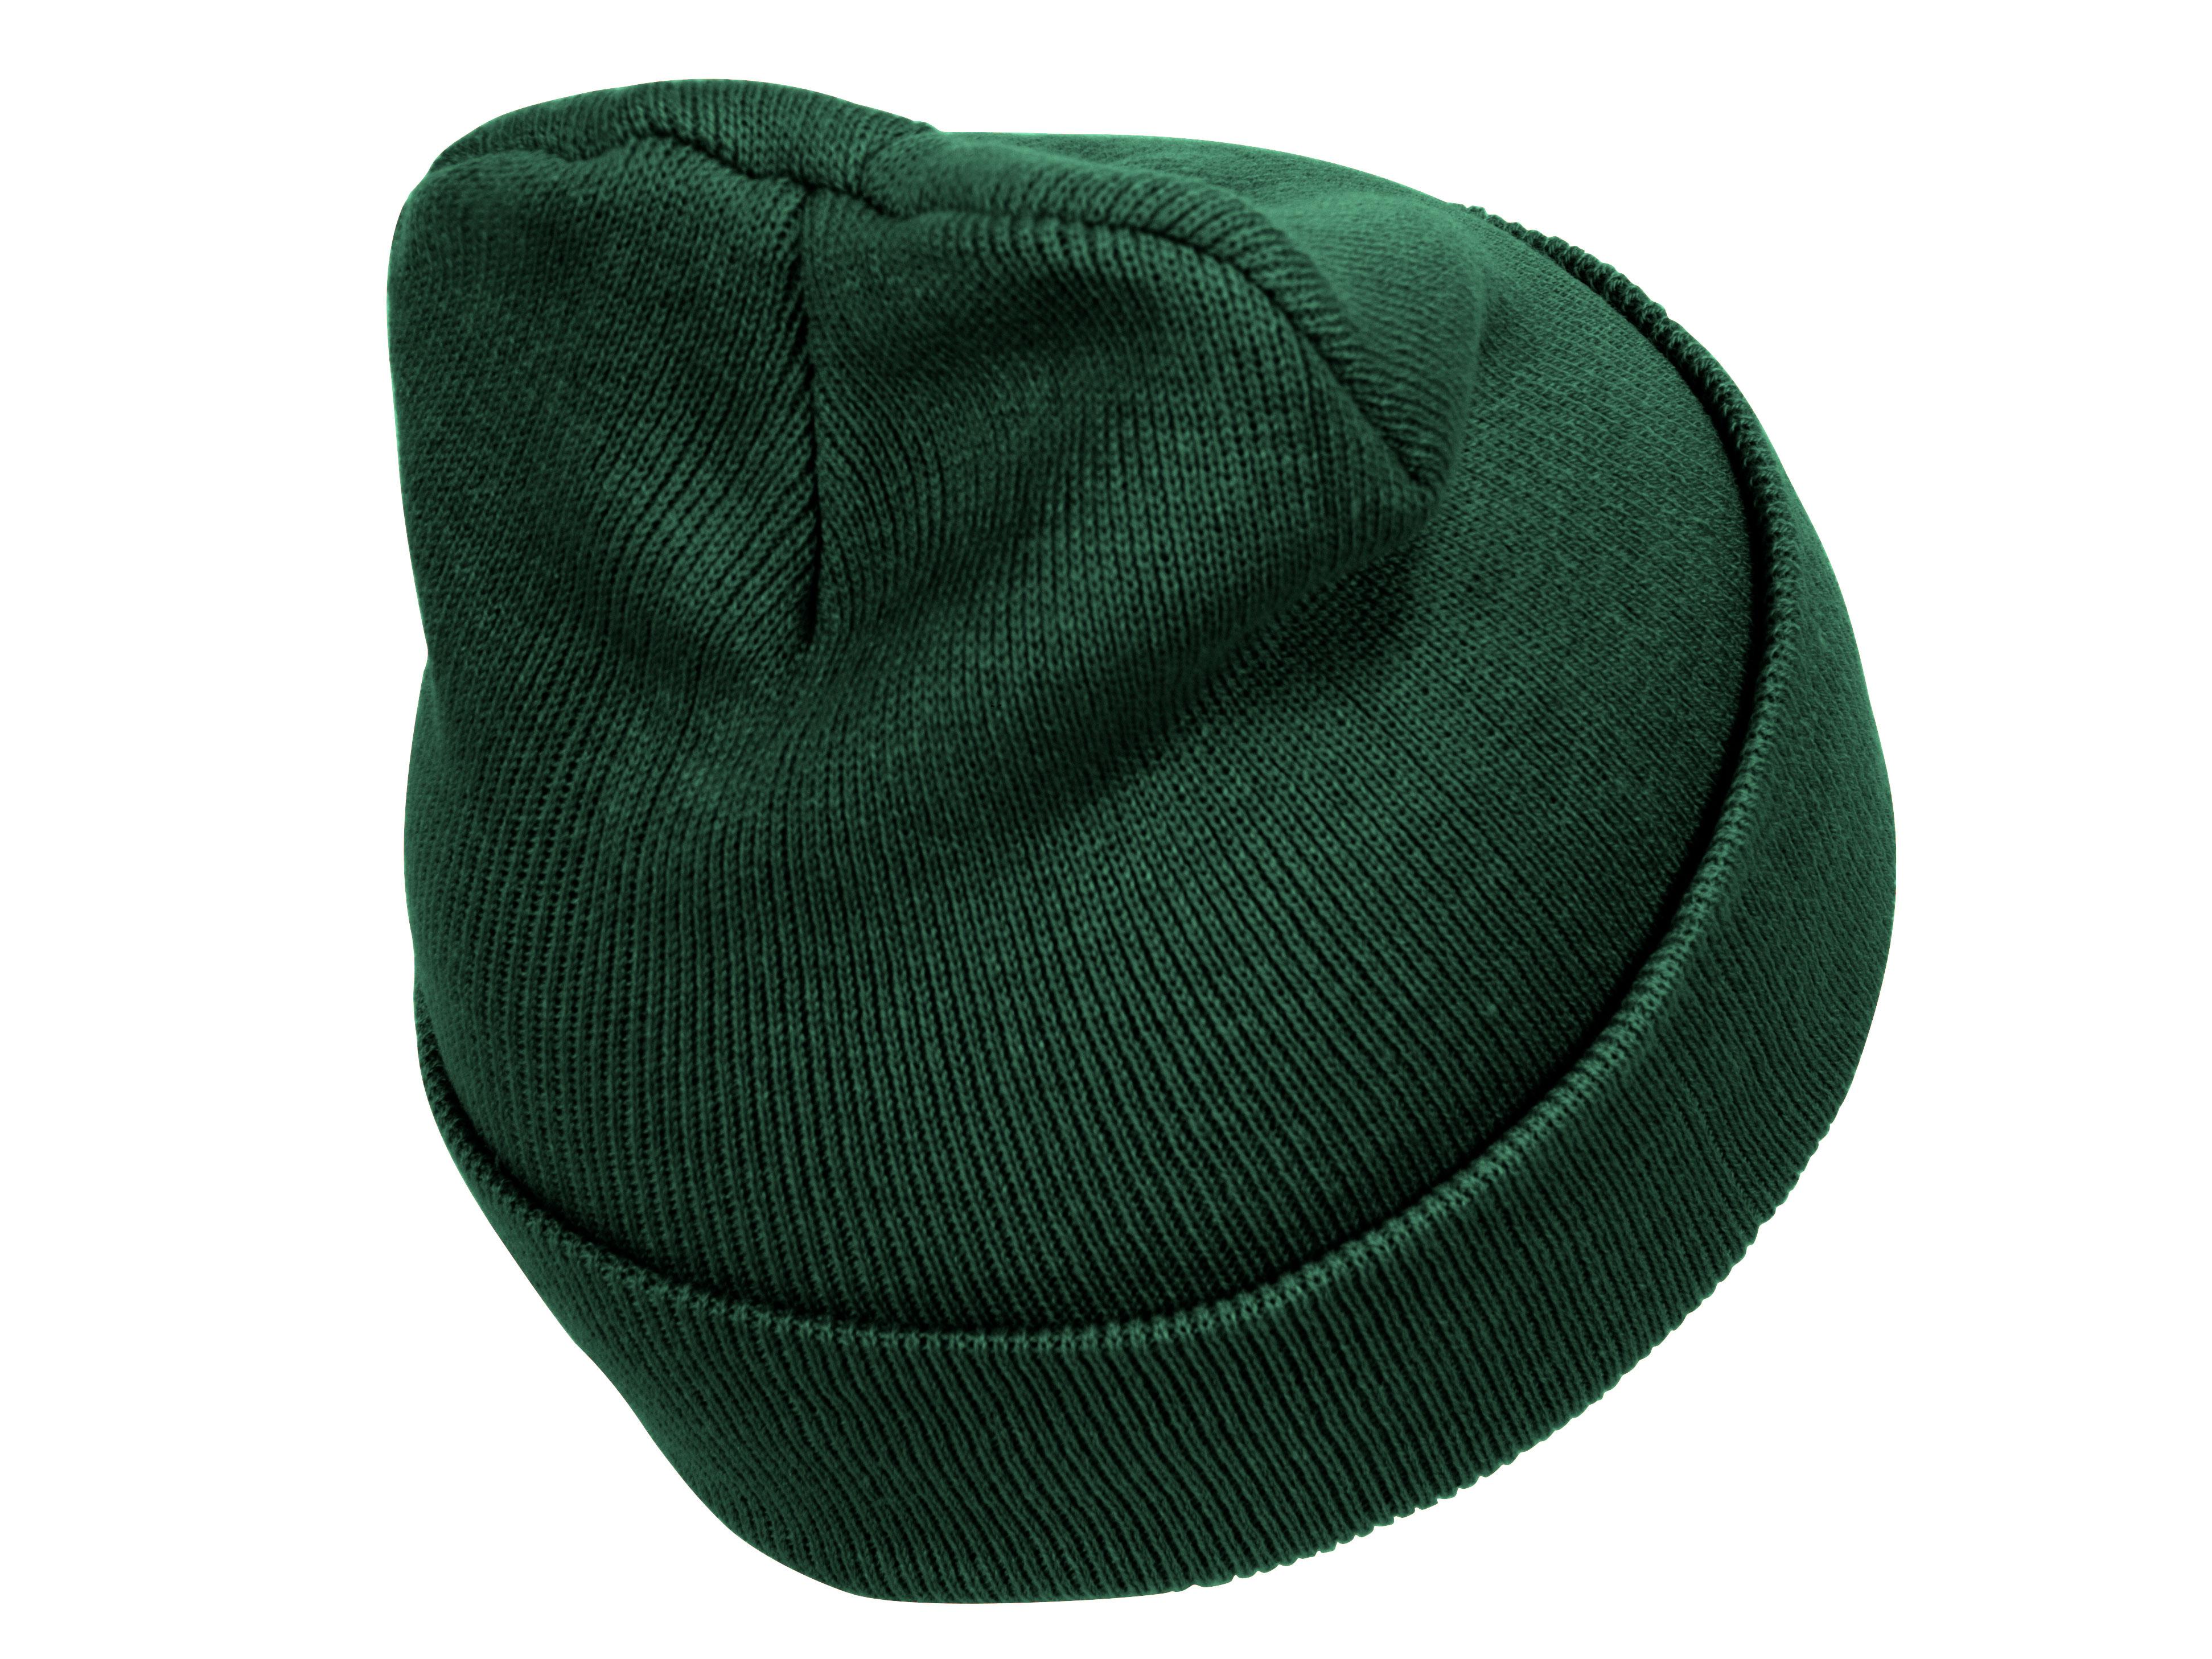 thumbnail 23 - Top Headwear Solid Winter Long Beanie - 12 Piece Wholesale